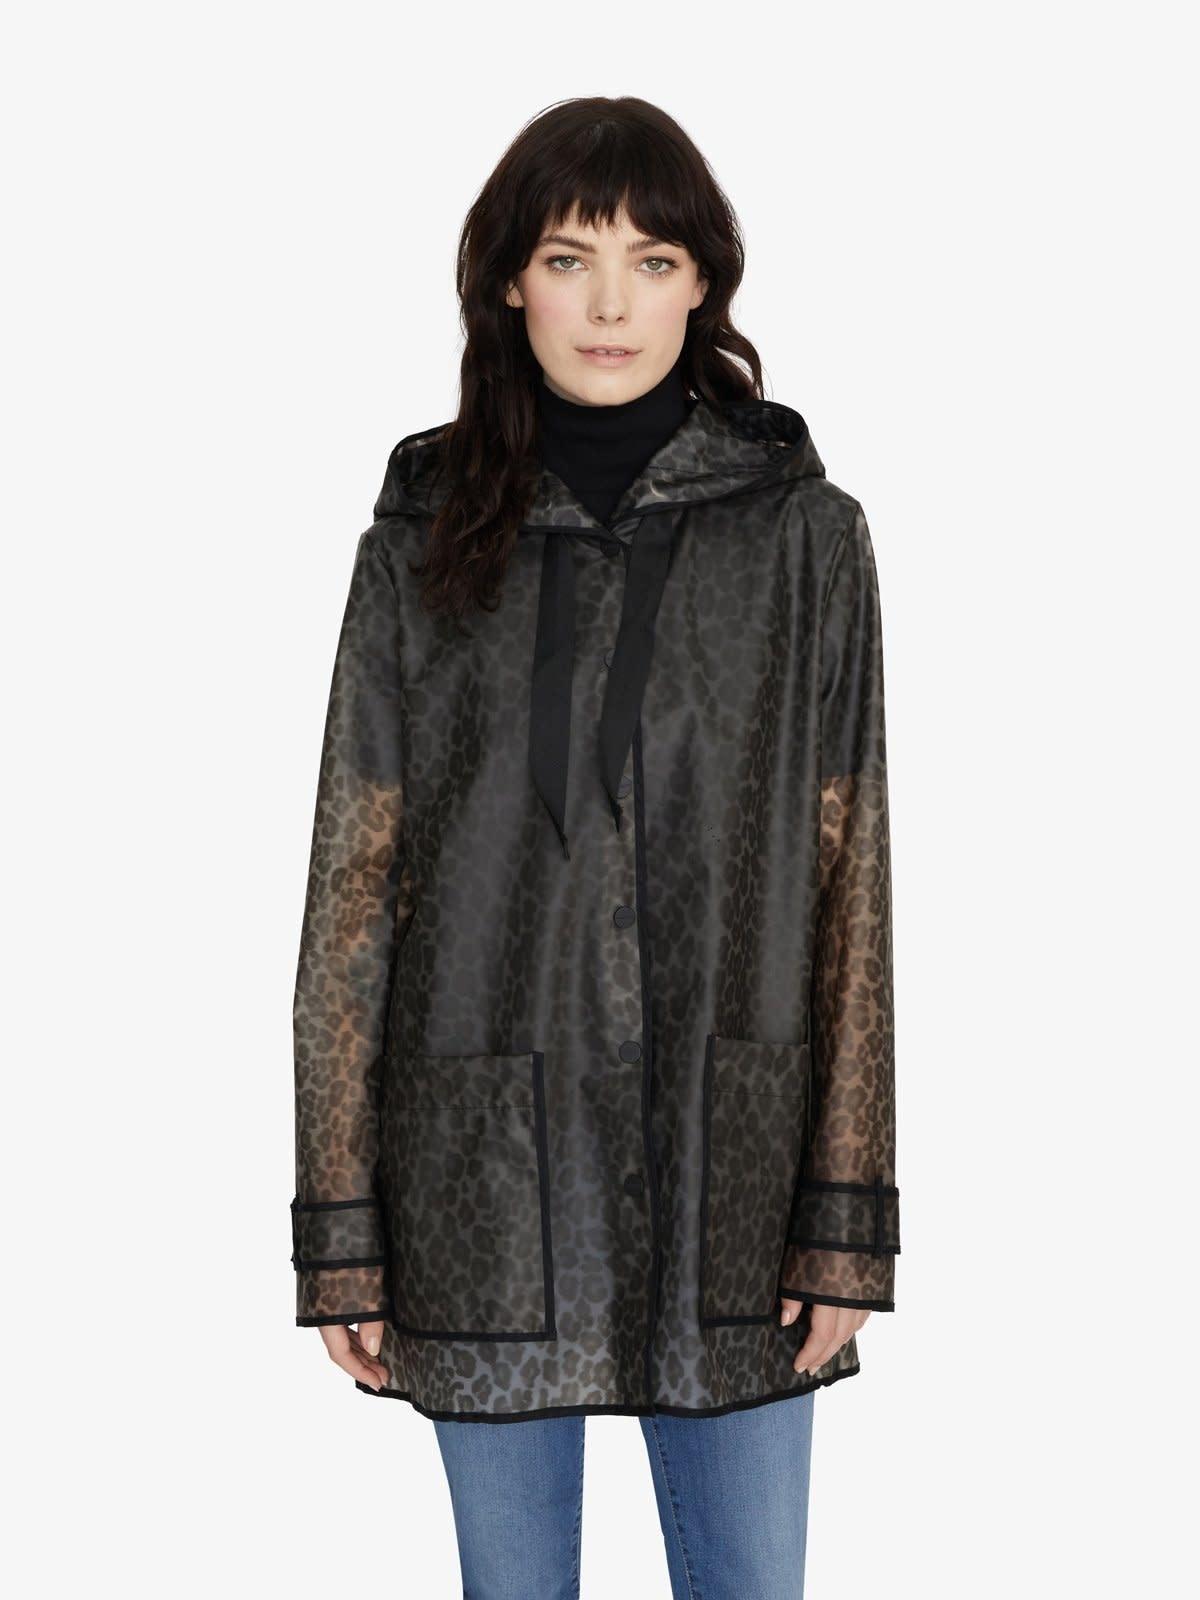 Sanctuary Rainy Day Coat